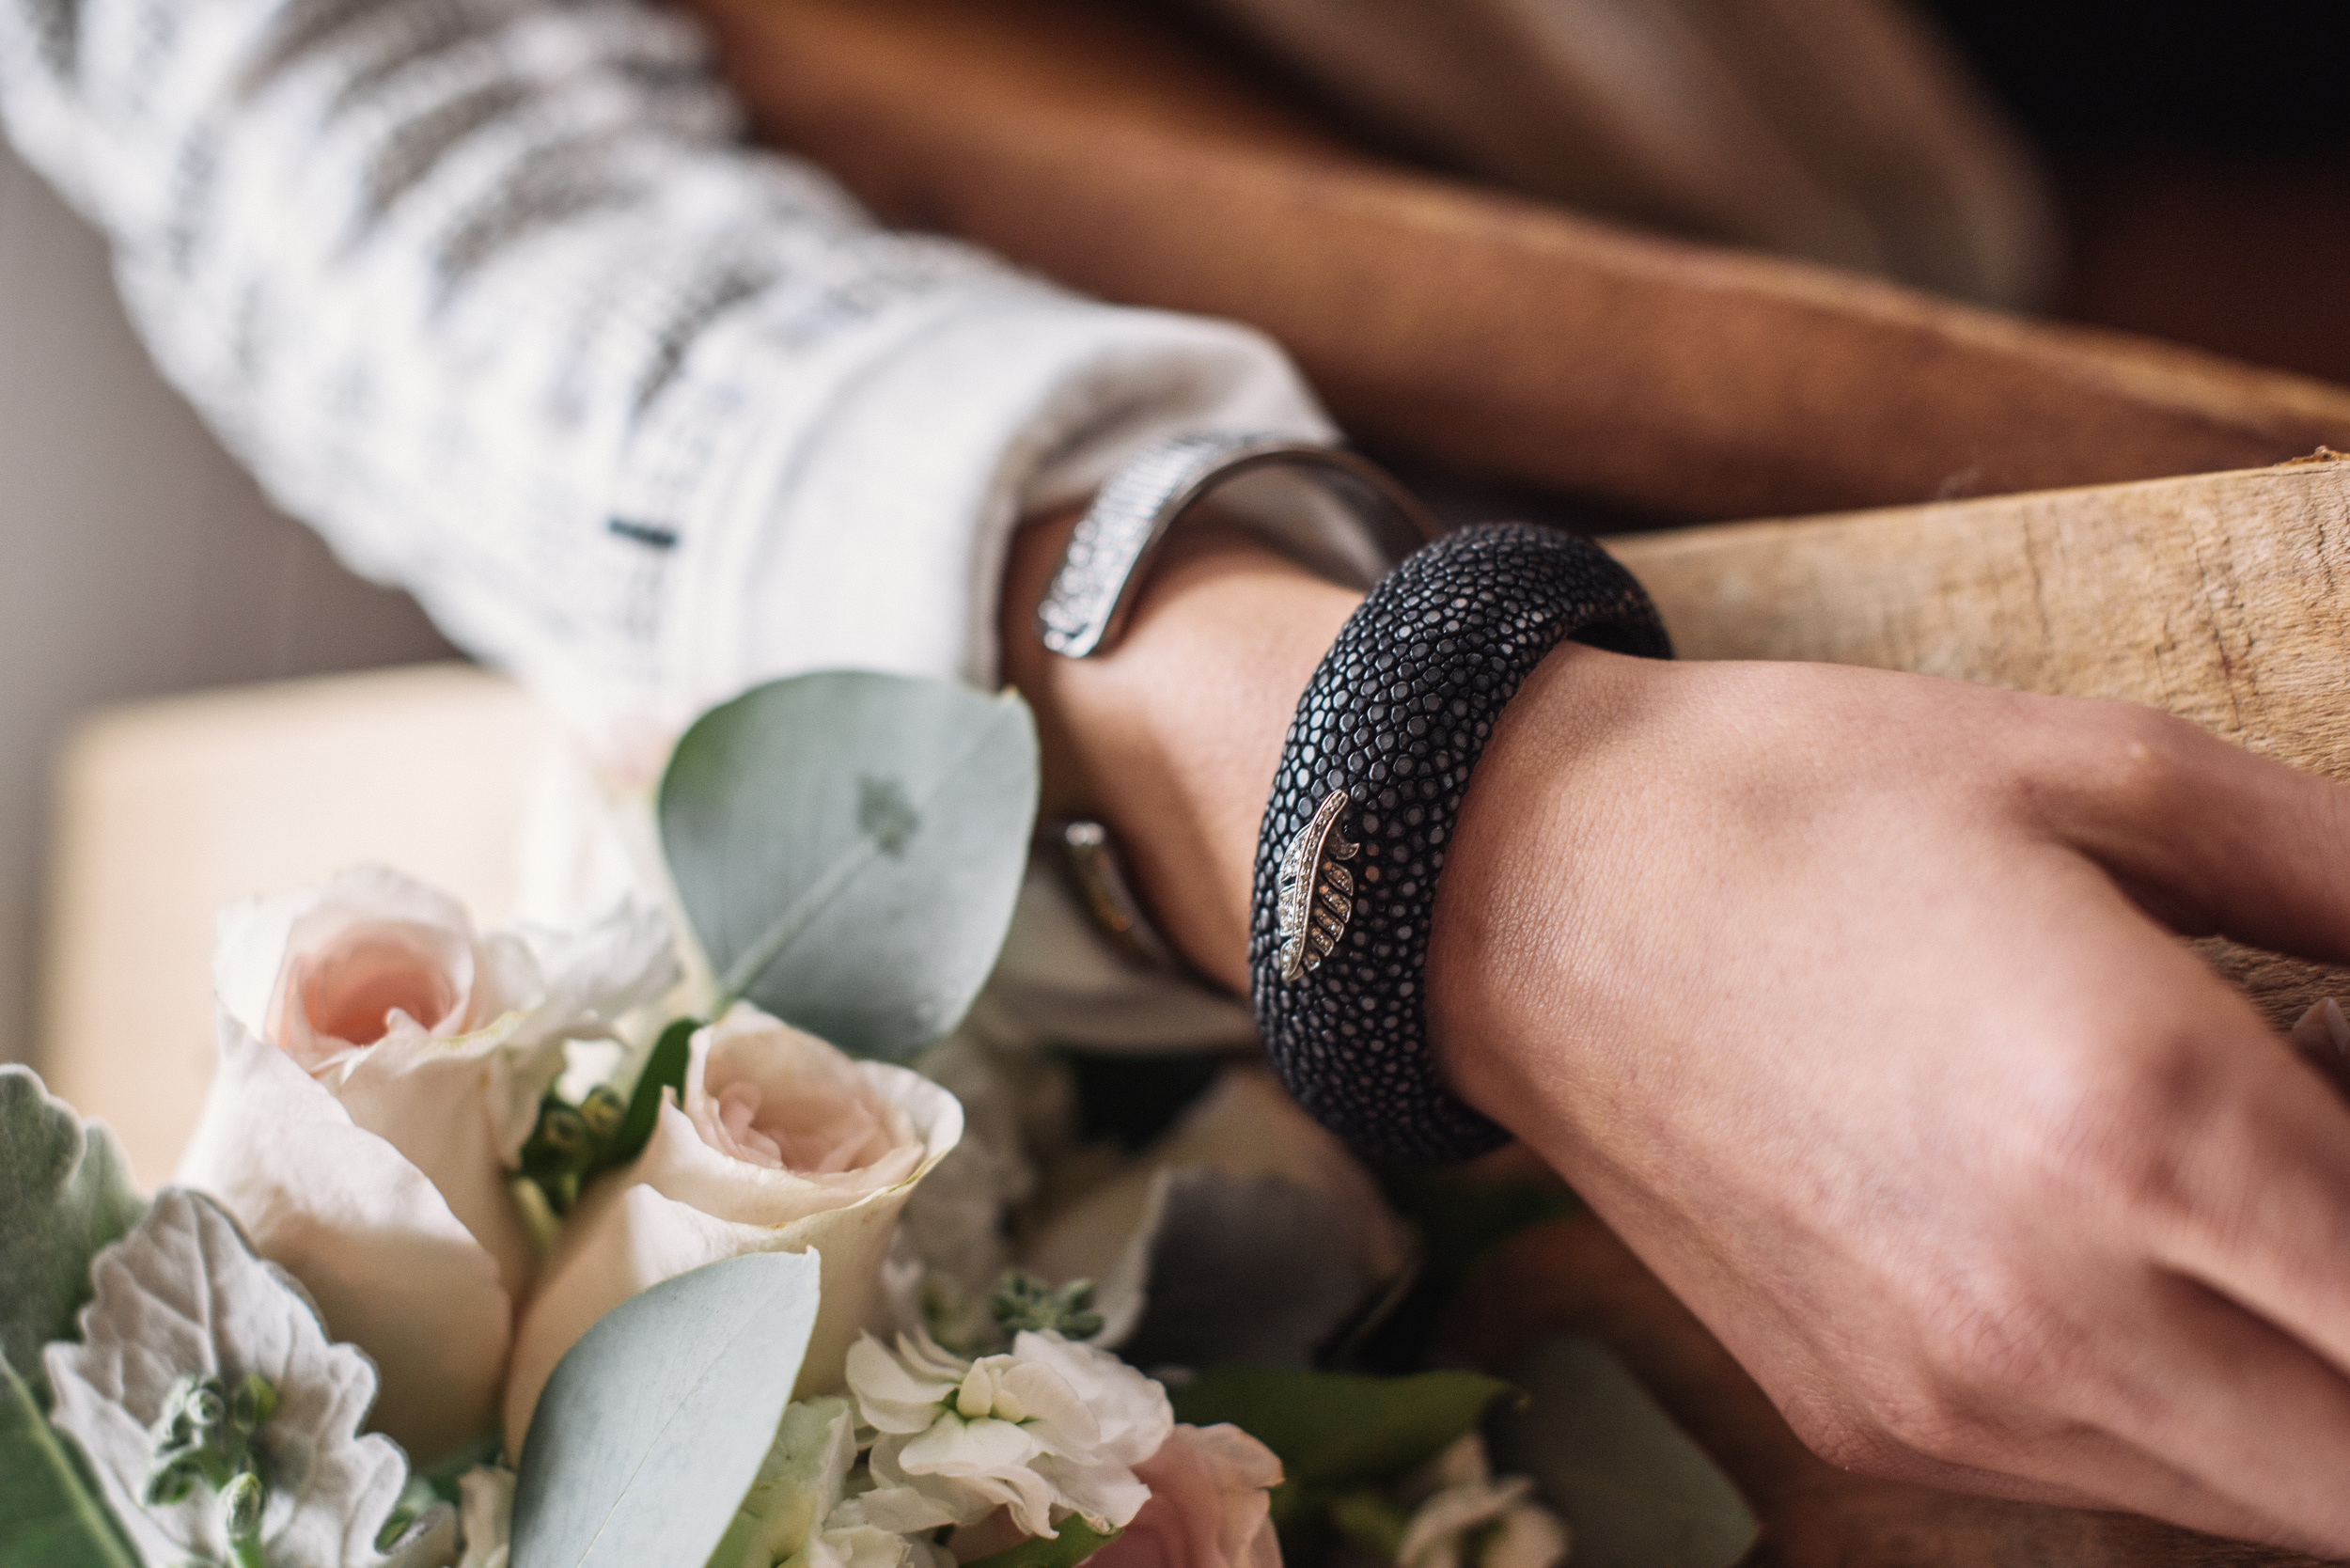 Aviva Rose Jewelry Bracelets